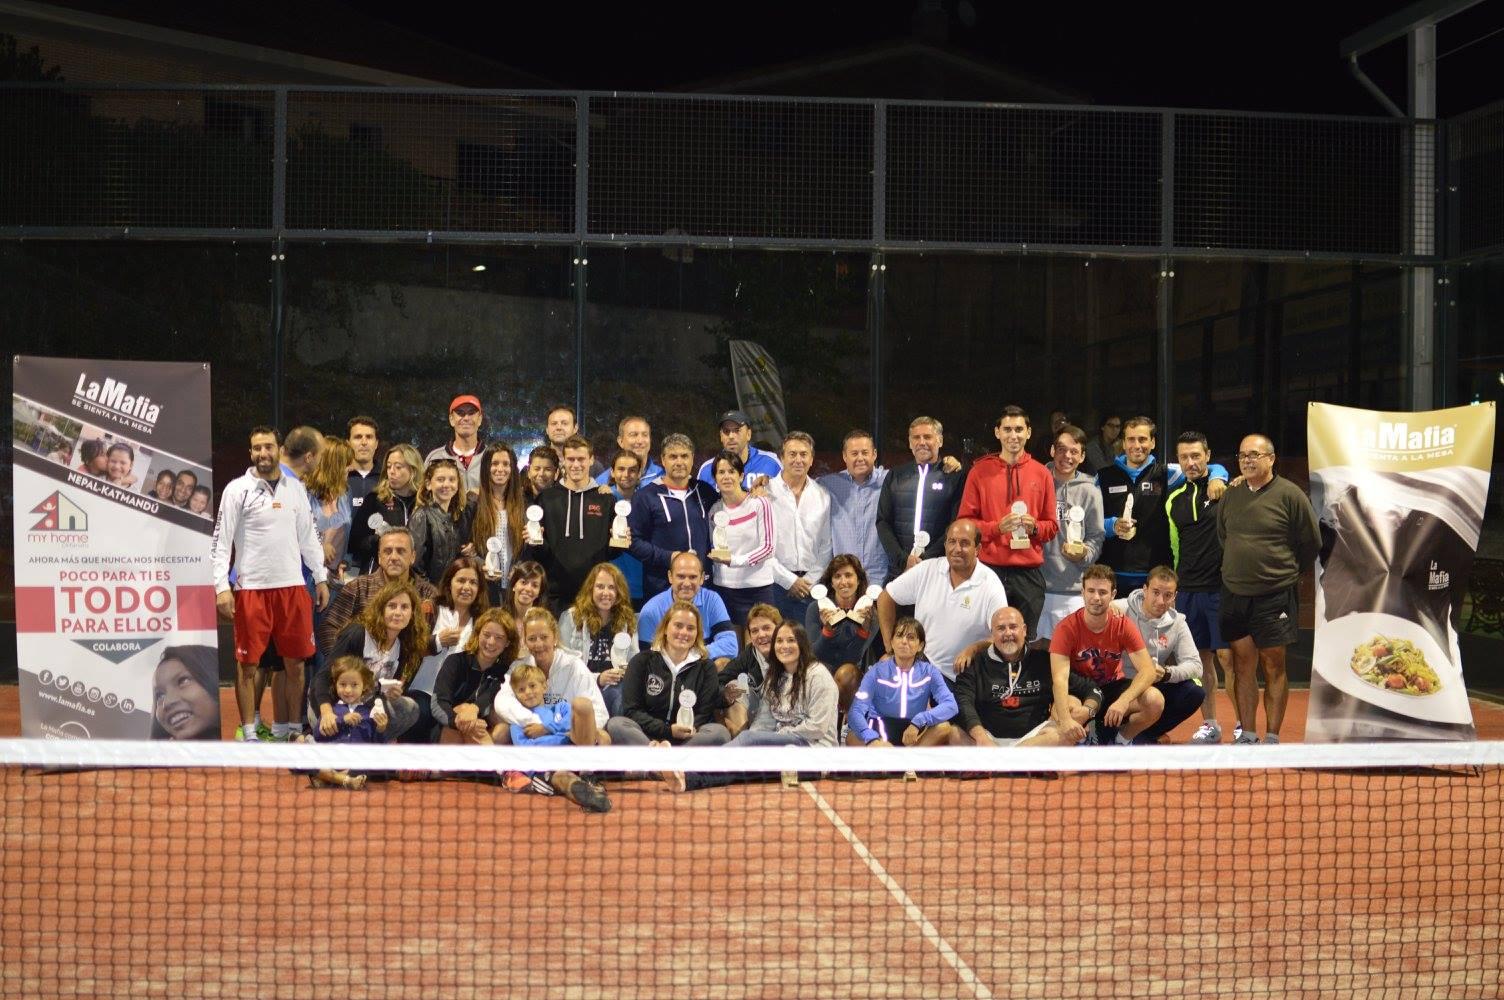 14481984 320545578306410 324666539413073546 o - La Mafia con el Deporte. Torneo de La Mafia Colmenar Viejo.